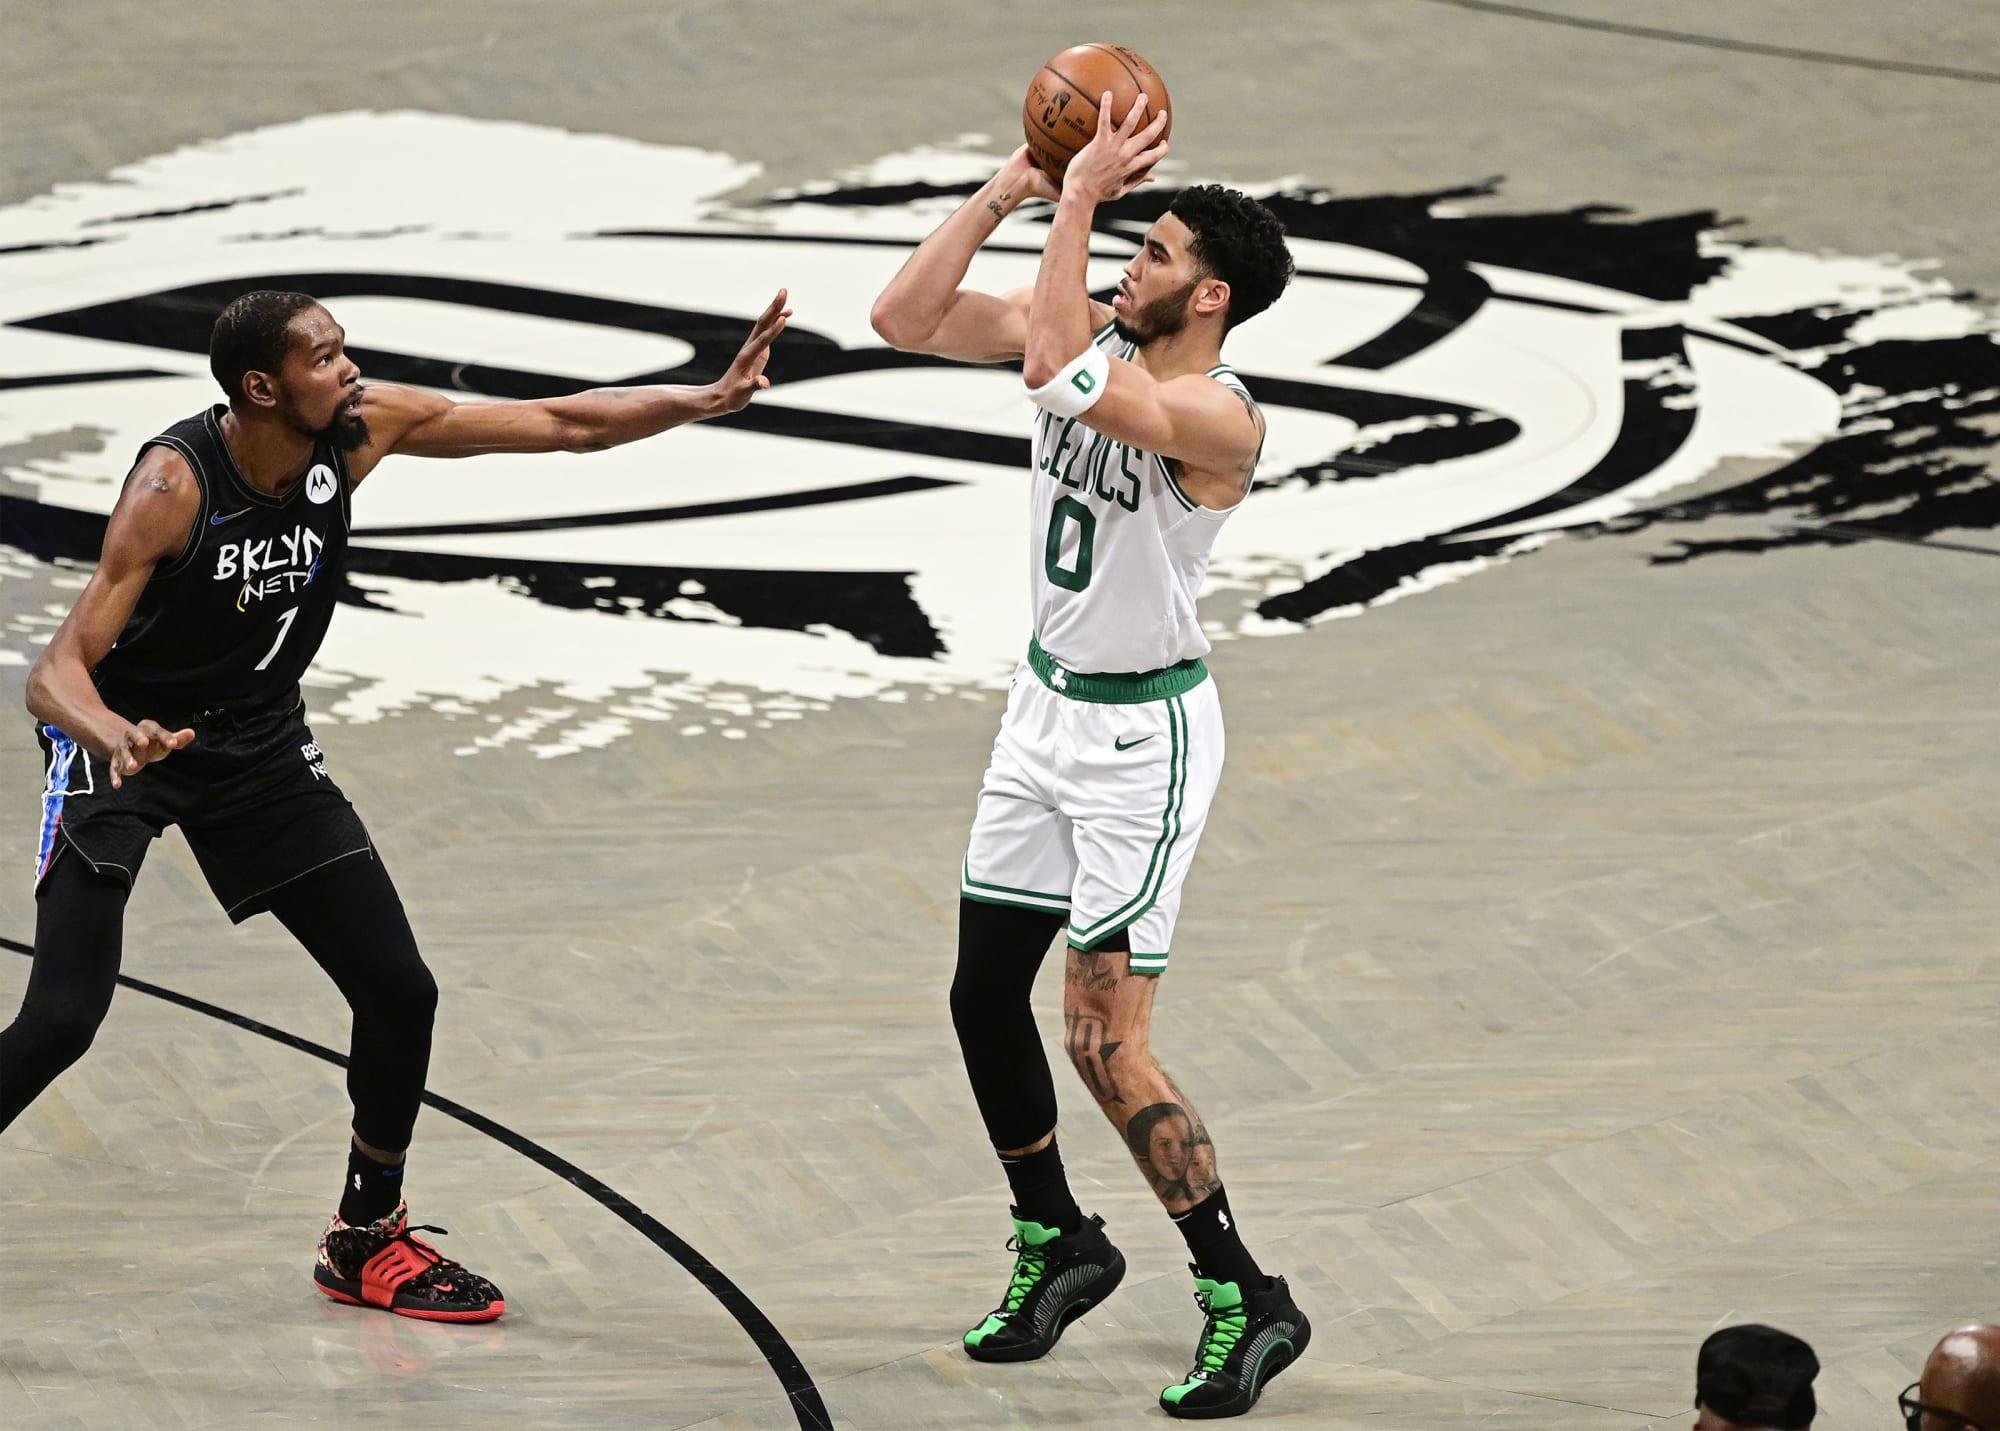 Boston Celtics news: Jayson Tatum will make league pay for All-NBA snub - Chowder and Champions